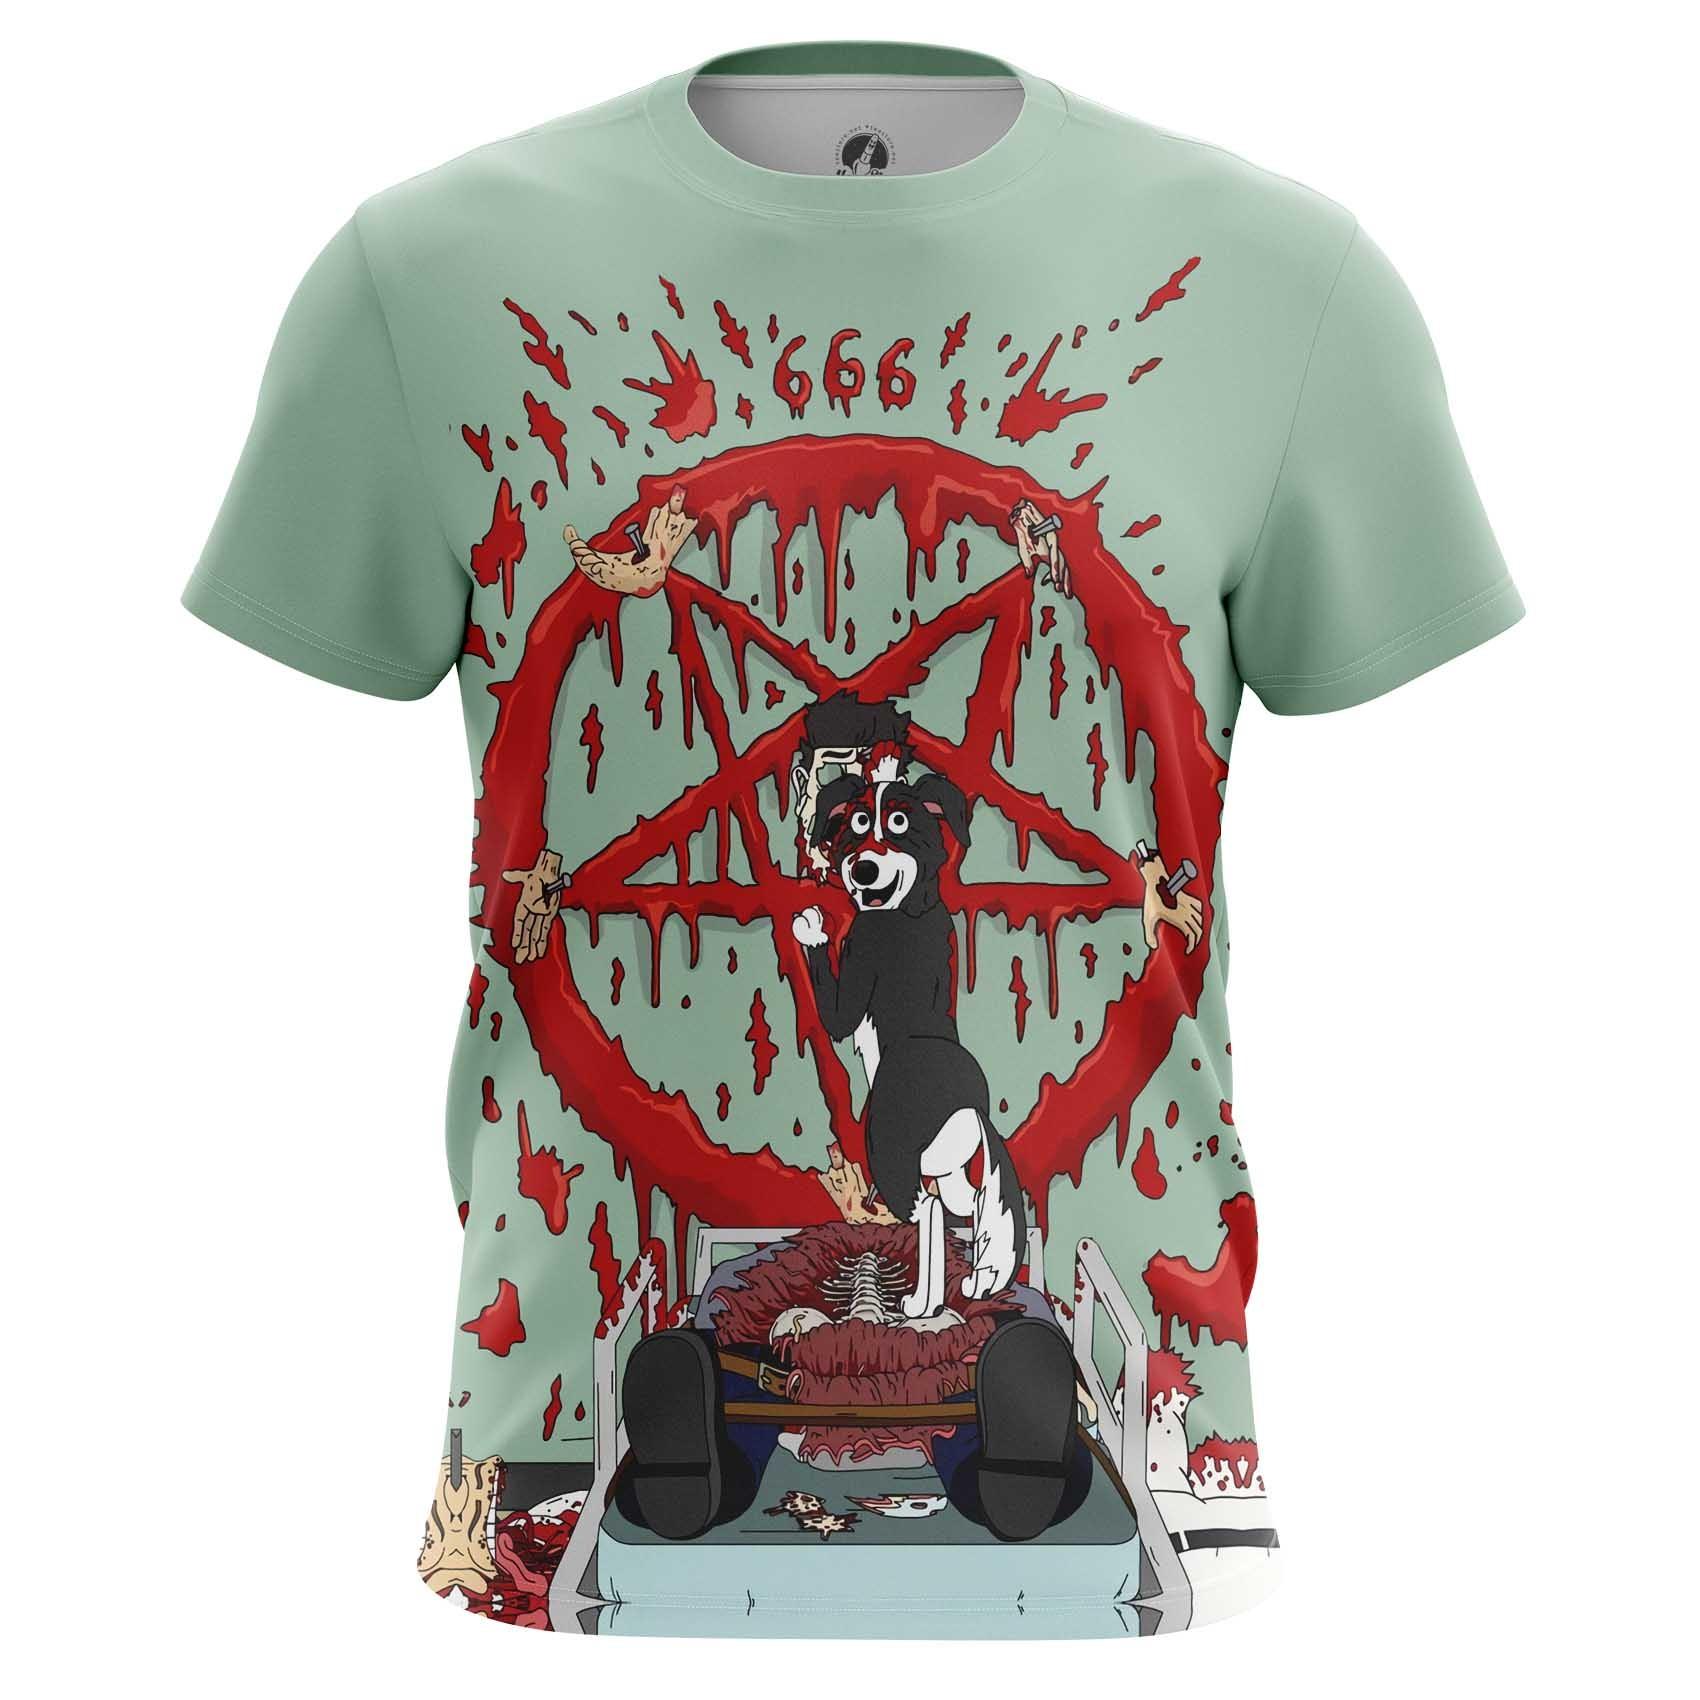 Merchandise T-Shirt Mr Pickles Worship Satan Sacrifice